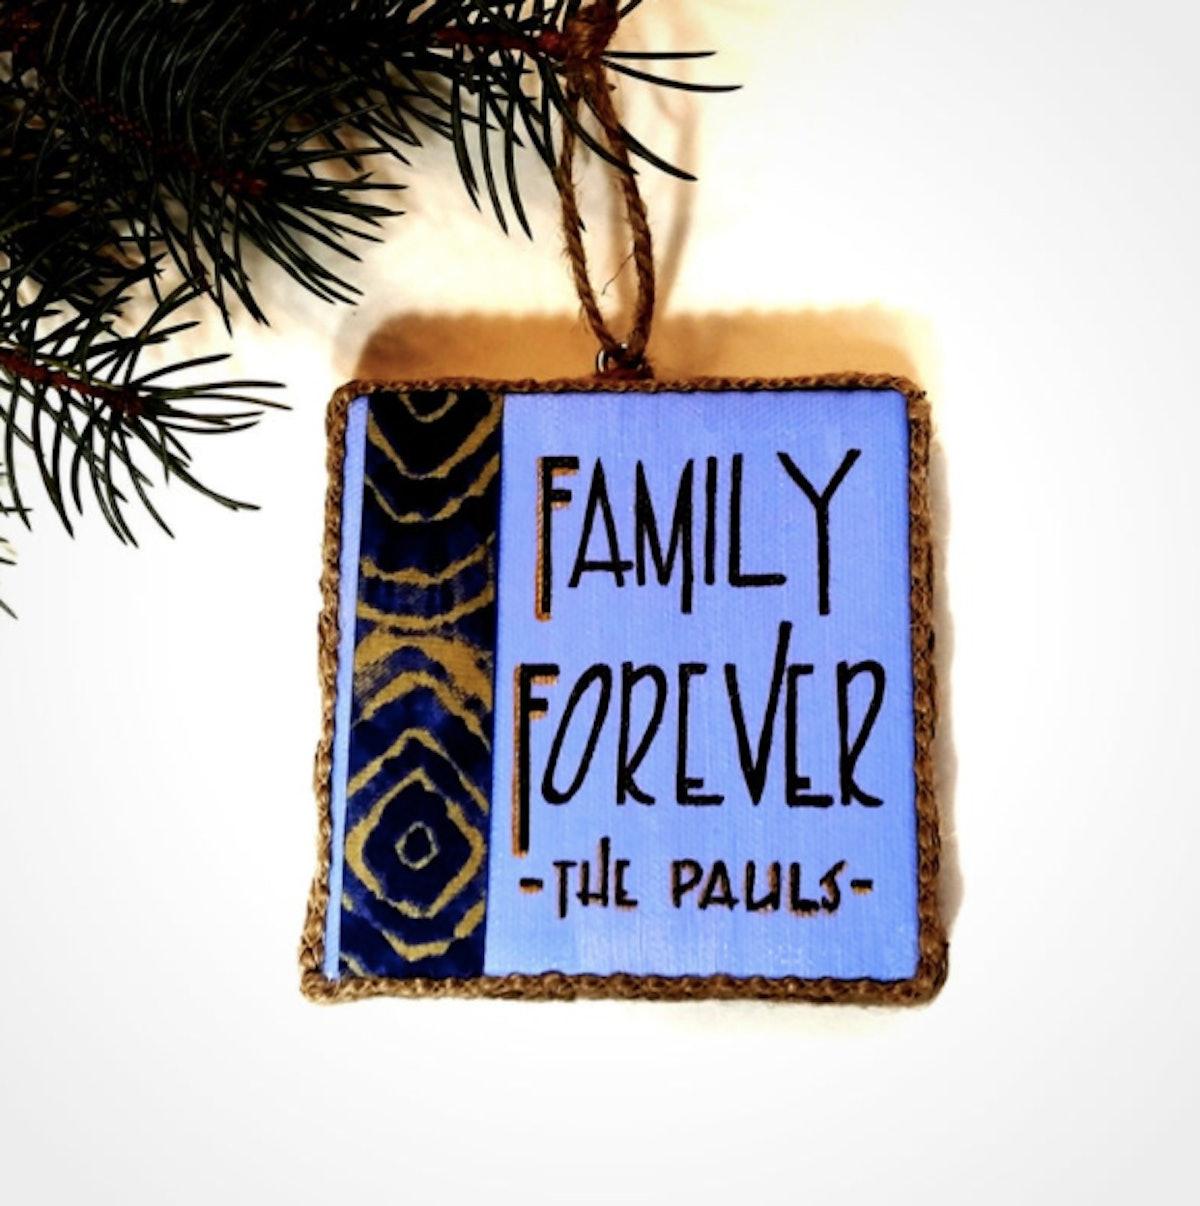 Christmas Ornament Family - Family Christmas Ornament - Personalized Family Christmas -African Ornaments -African Home Decor -Family Forever